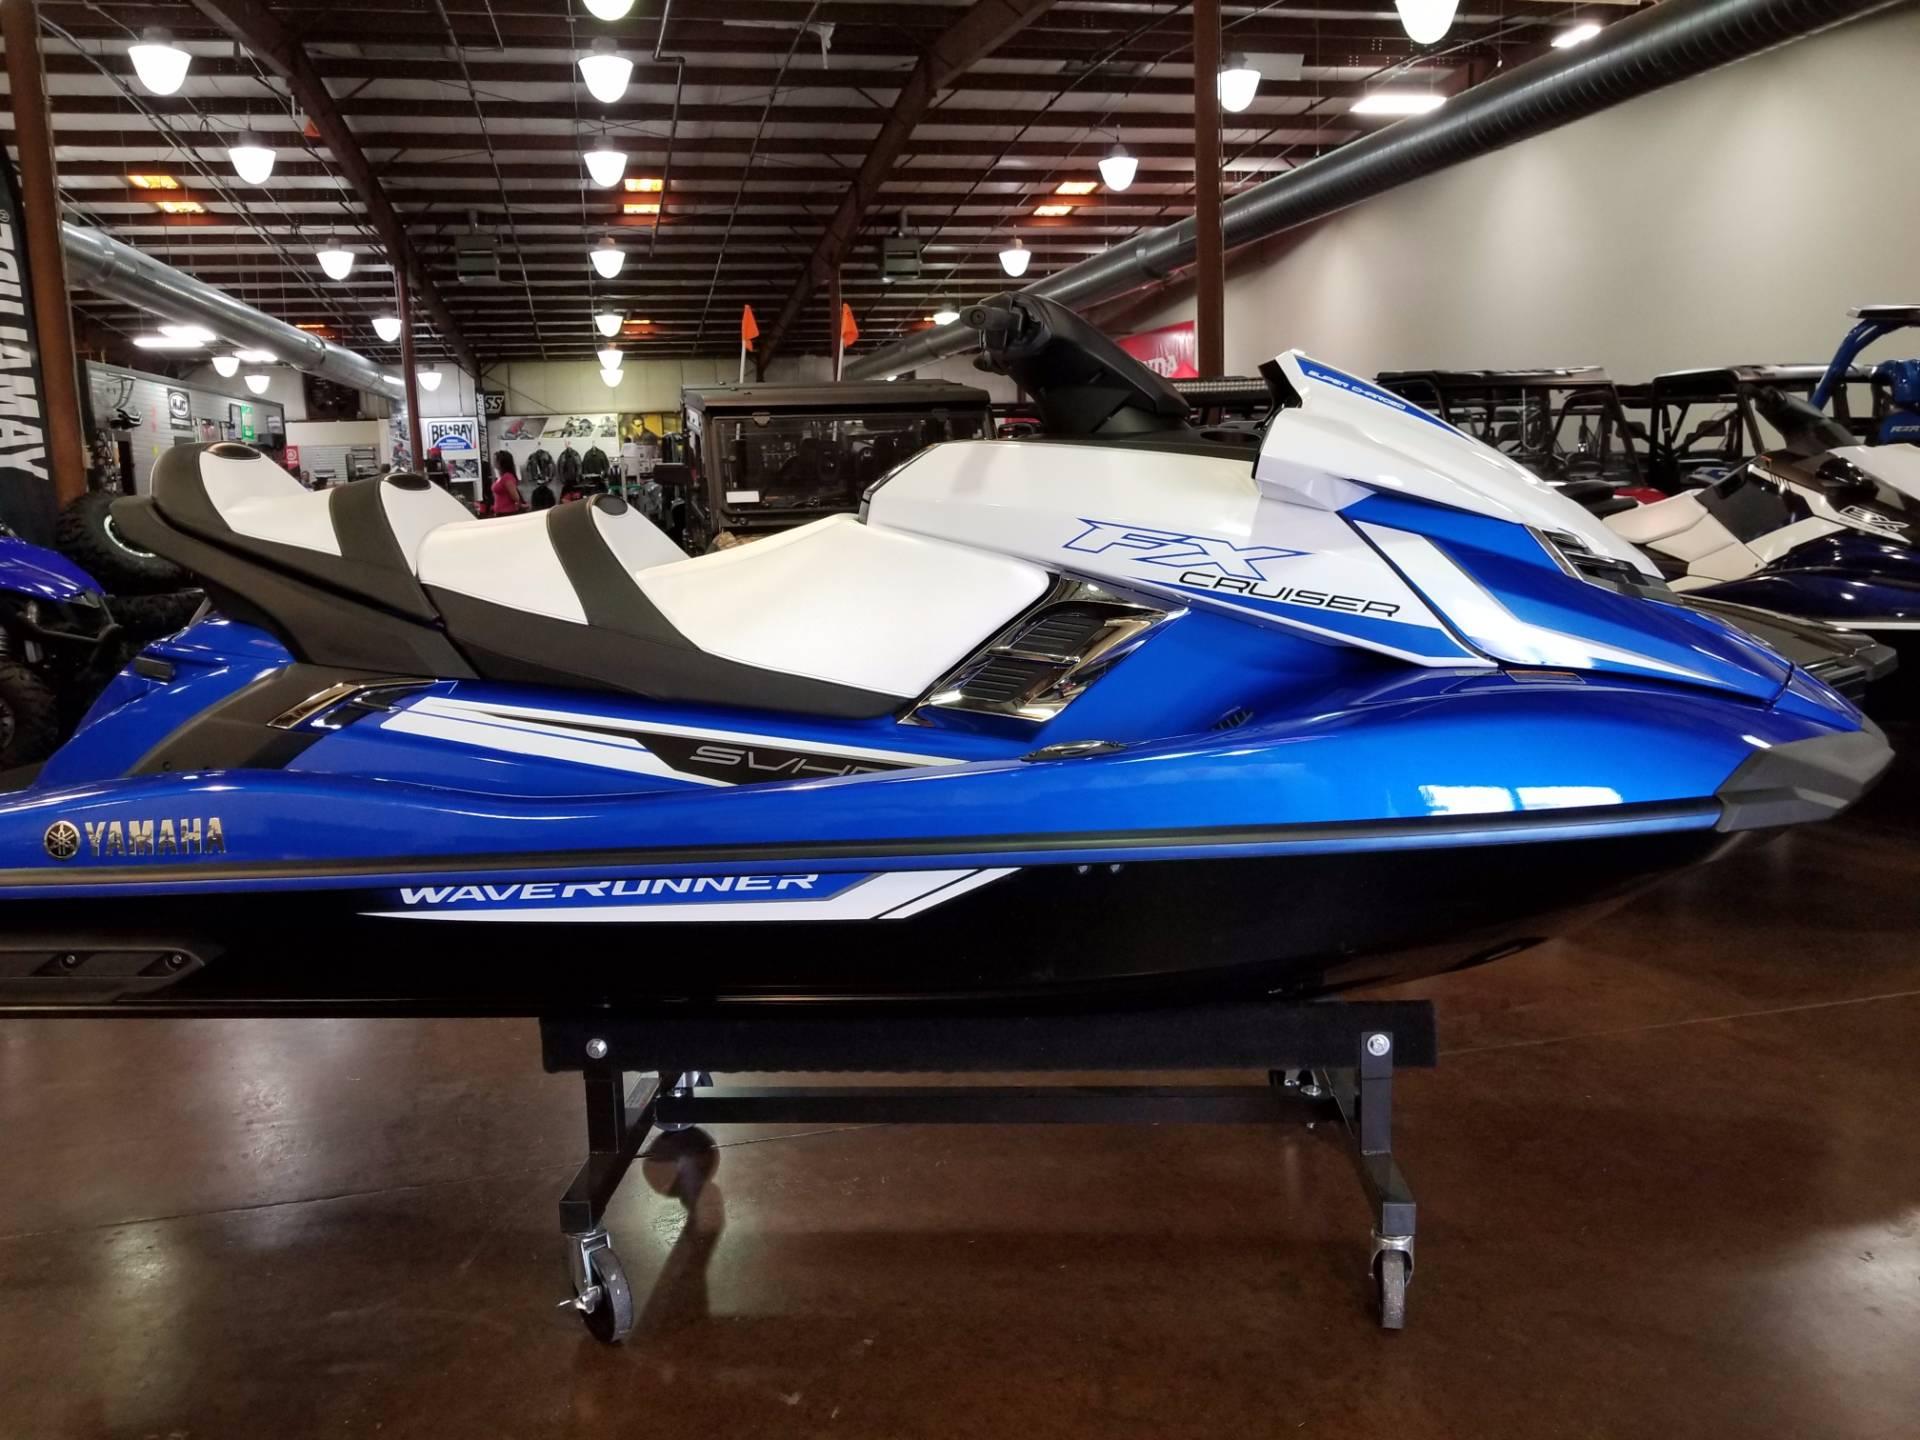 New 2018 yamaha fx cruiser svho watercraft in statesville for Yamaha cruiser 2018